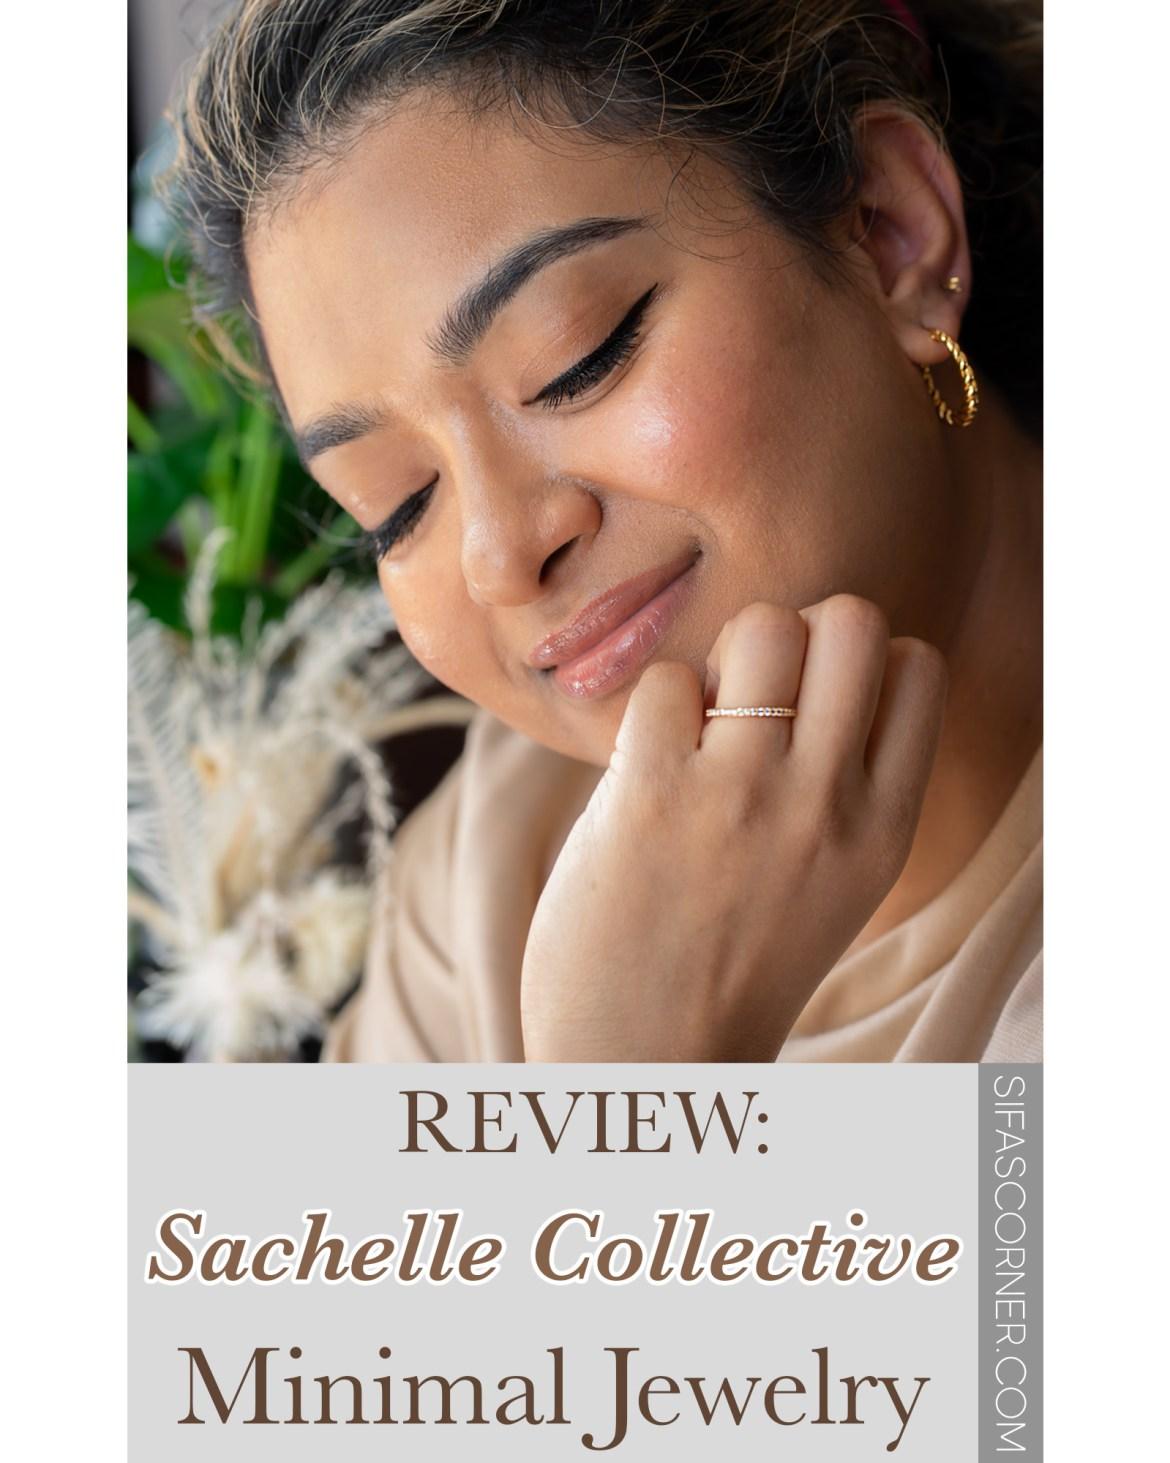 Sachelle Collective MInimal Jewelry